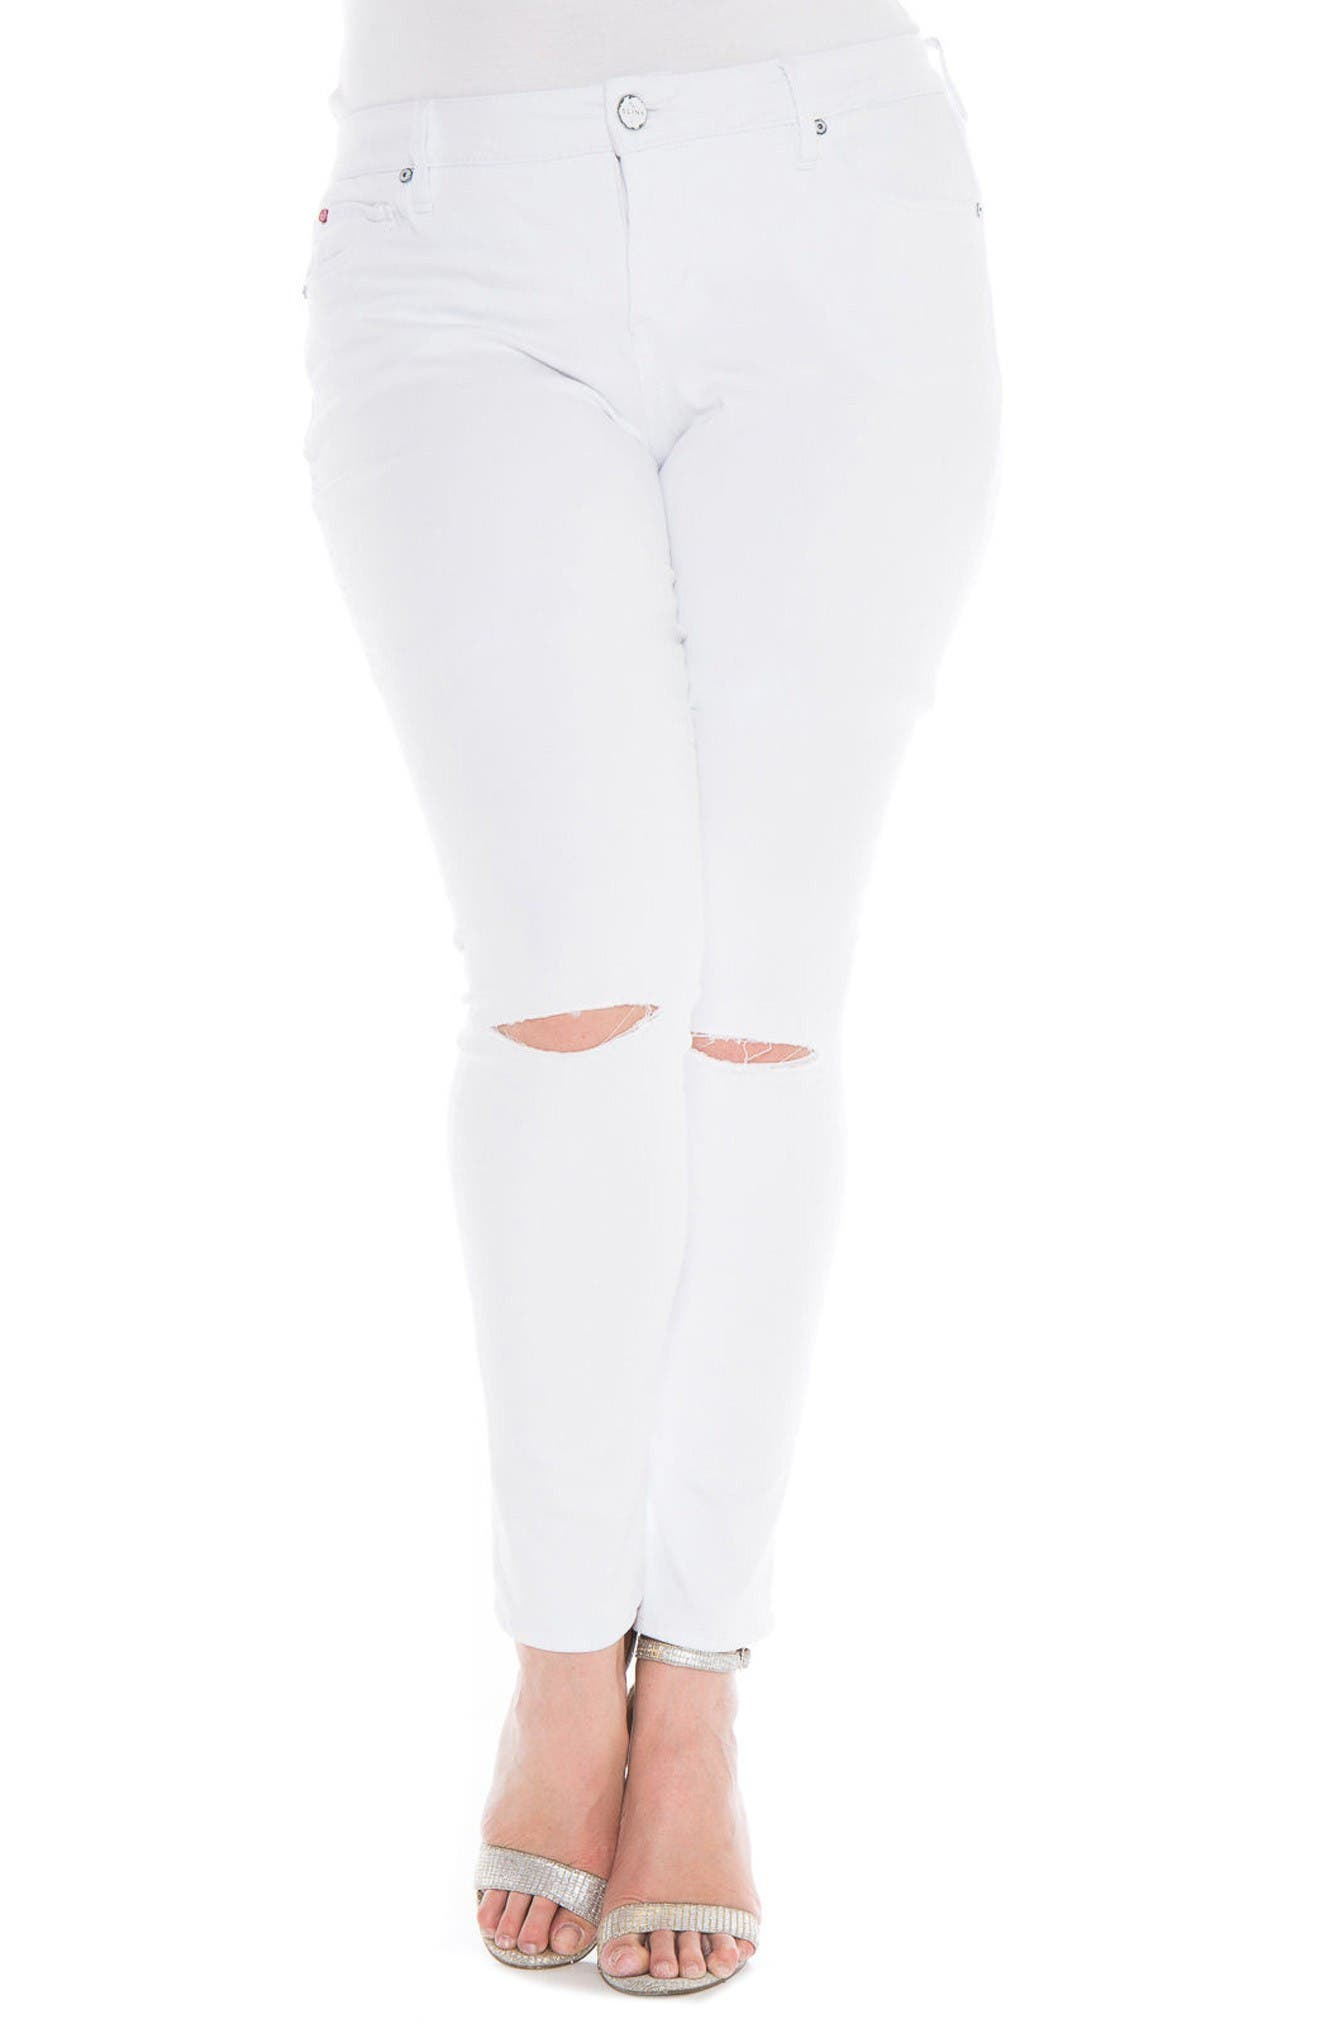 Main Image - SLINK Jeans Slit Knee Skinny Jeans (Lexy) (Plus Size)